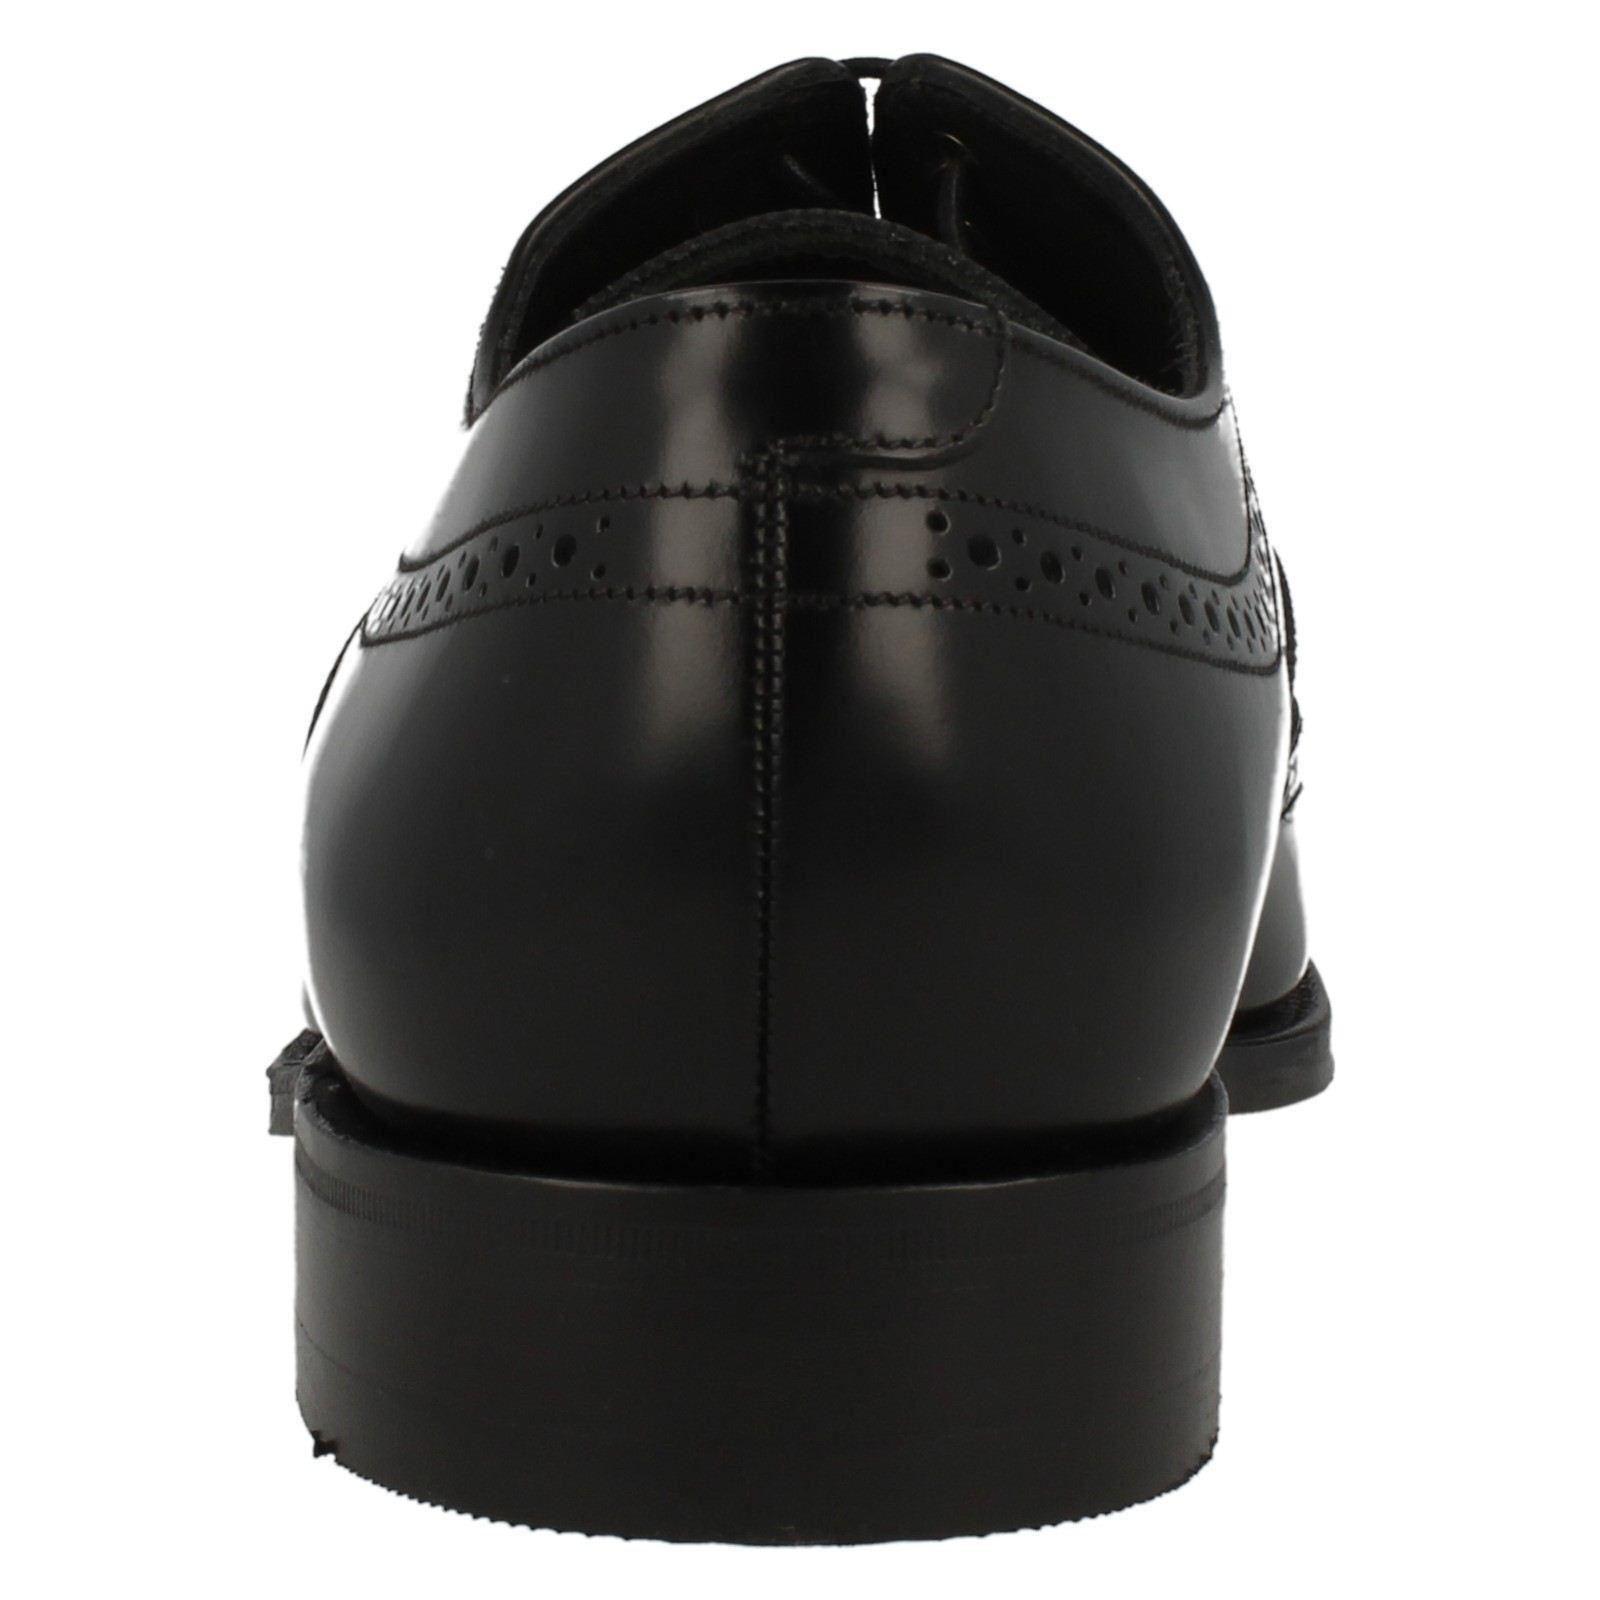 Loake Smart Jones Gents schwarz Formal Smart Loake Schuhes 4bca49